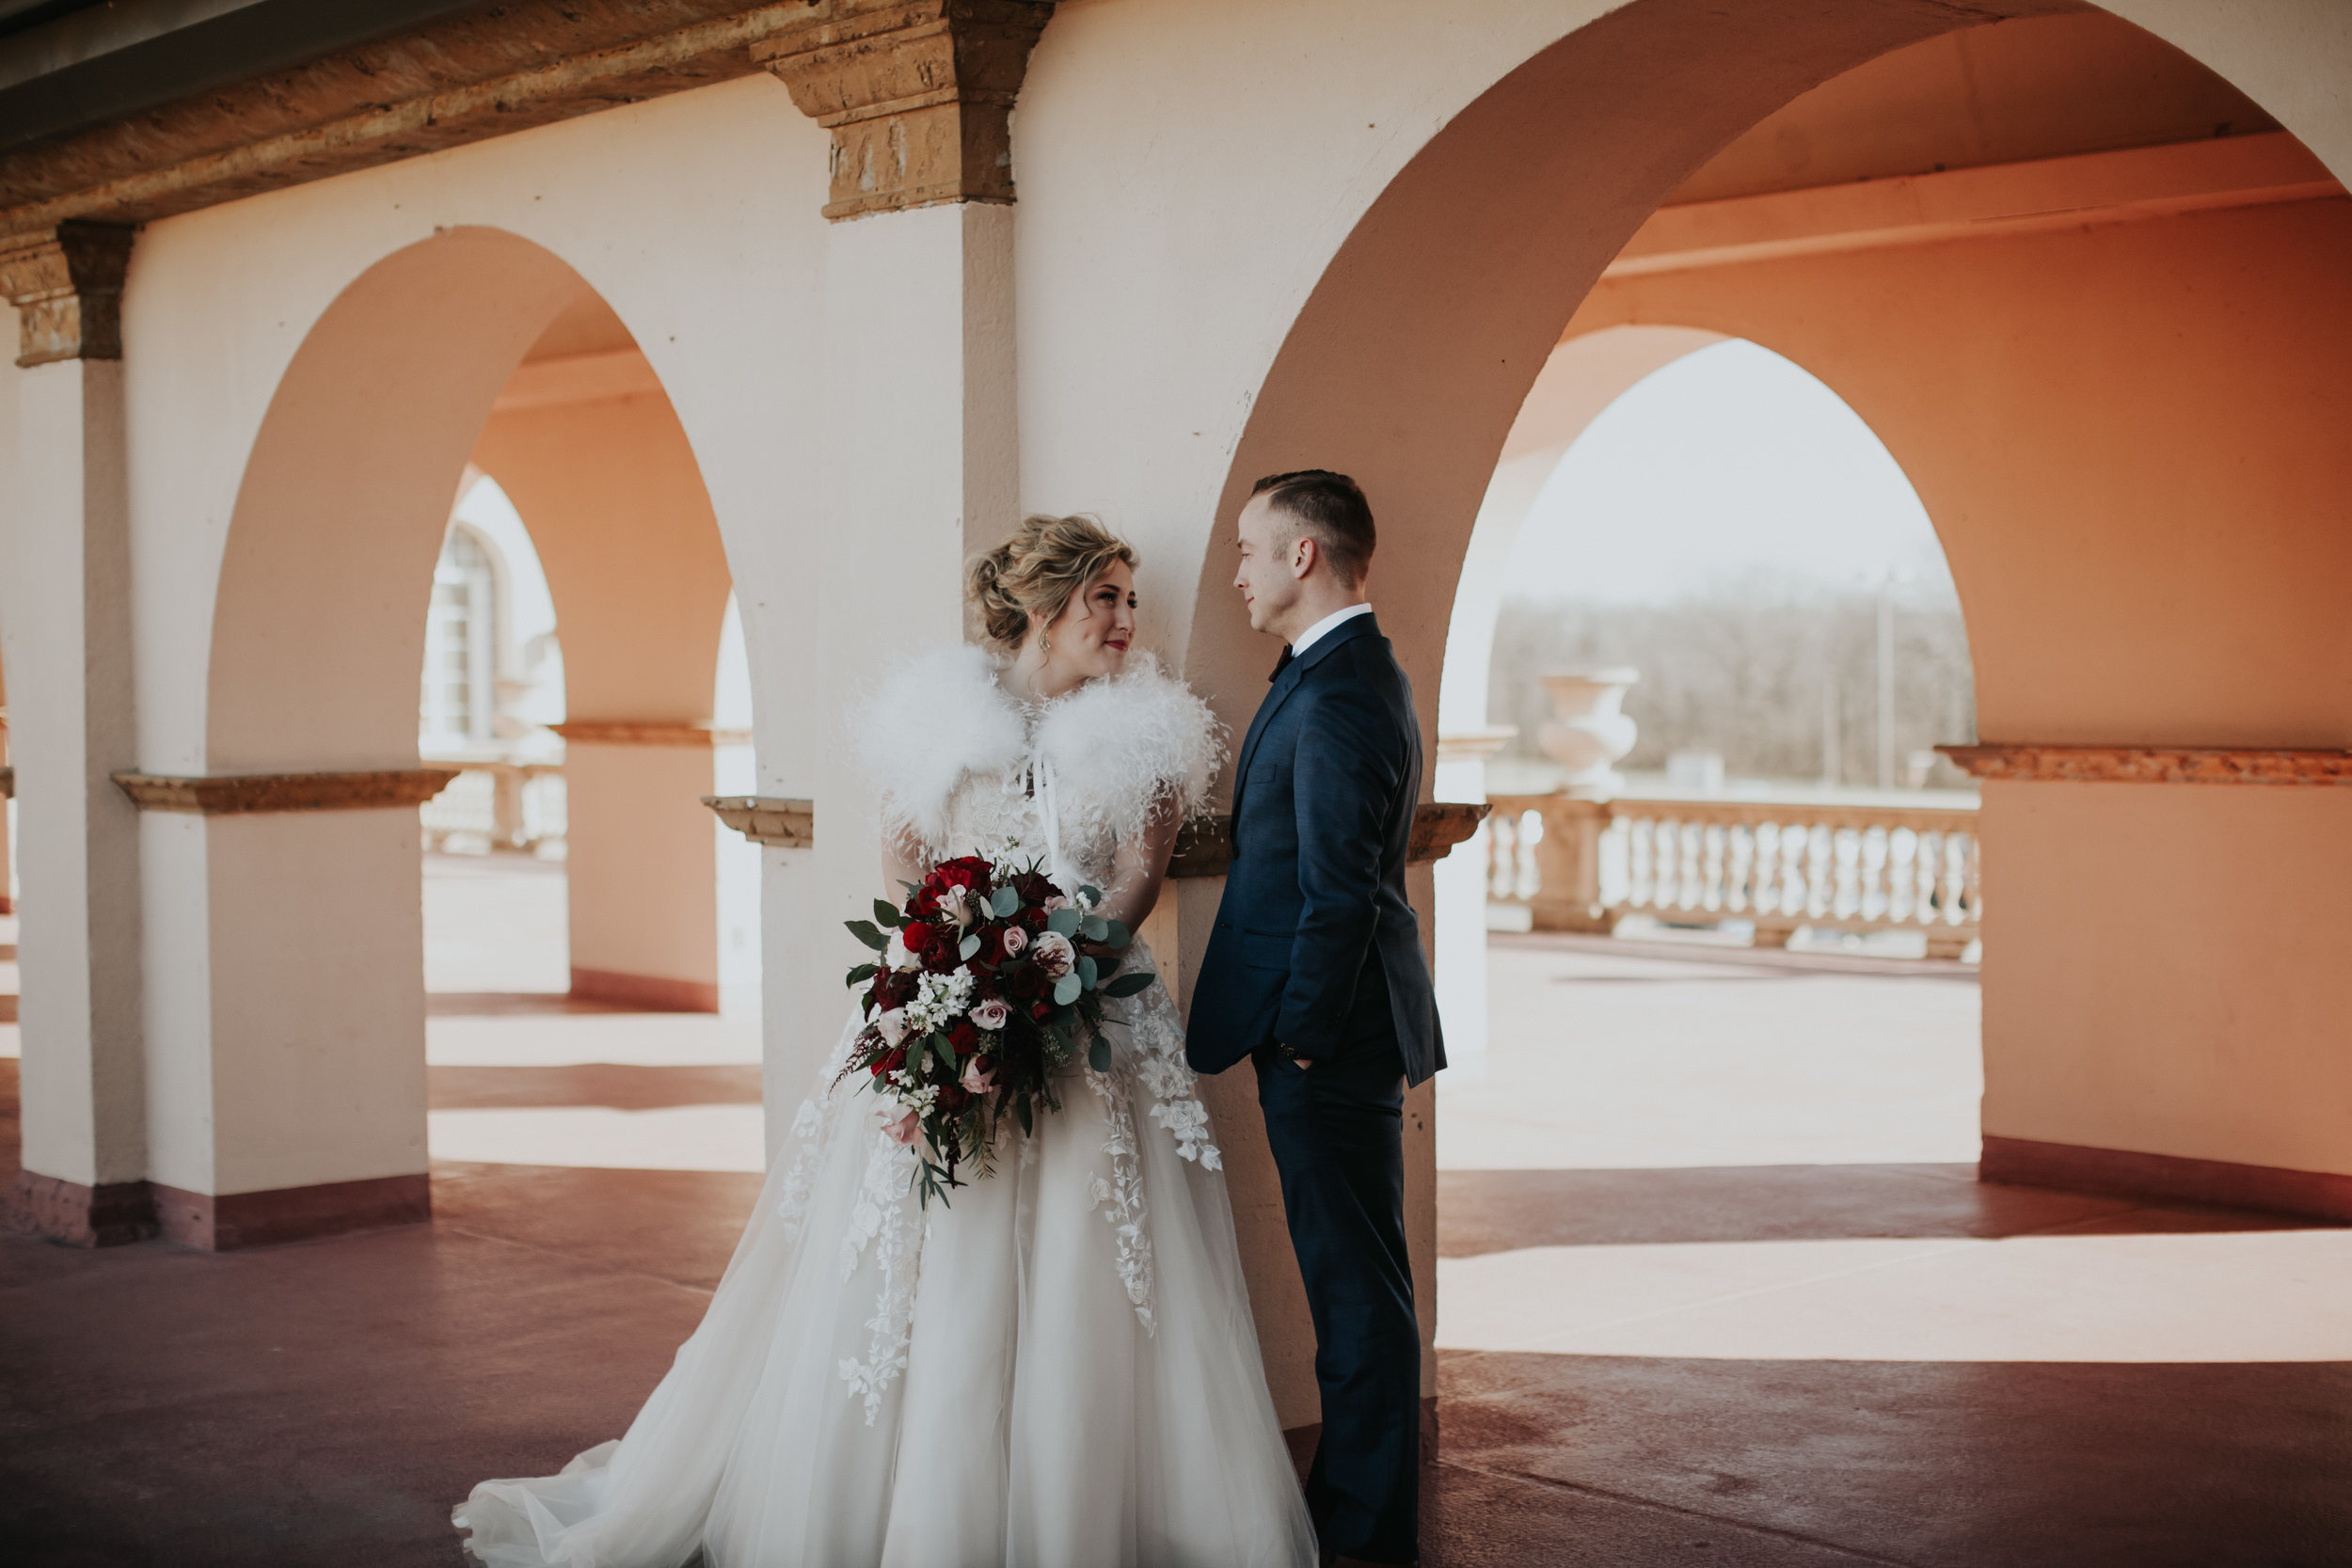 B+S.KrissieFrancisPhoto-428.jpgSeattle Wedding Photographer | Olympia Wedding Photographer | Washington Wedding Photographer | Krissie Francis Photo